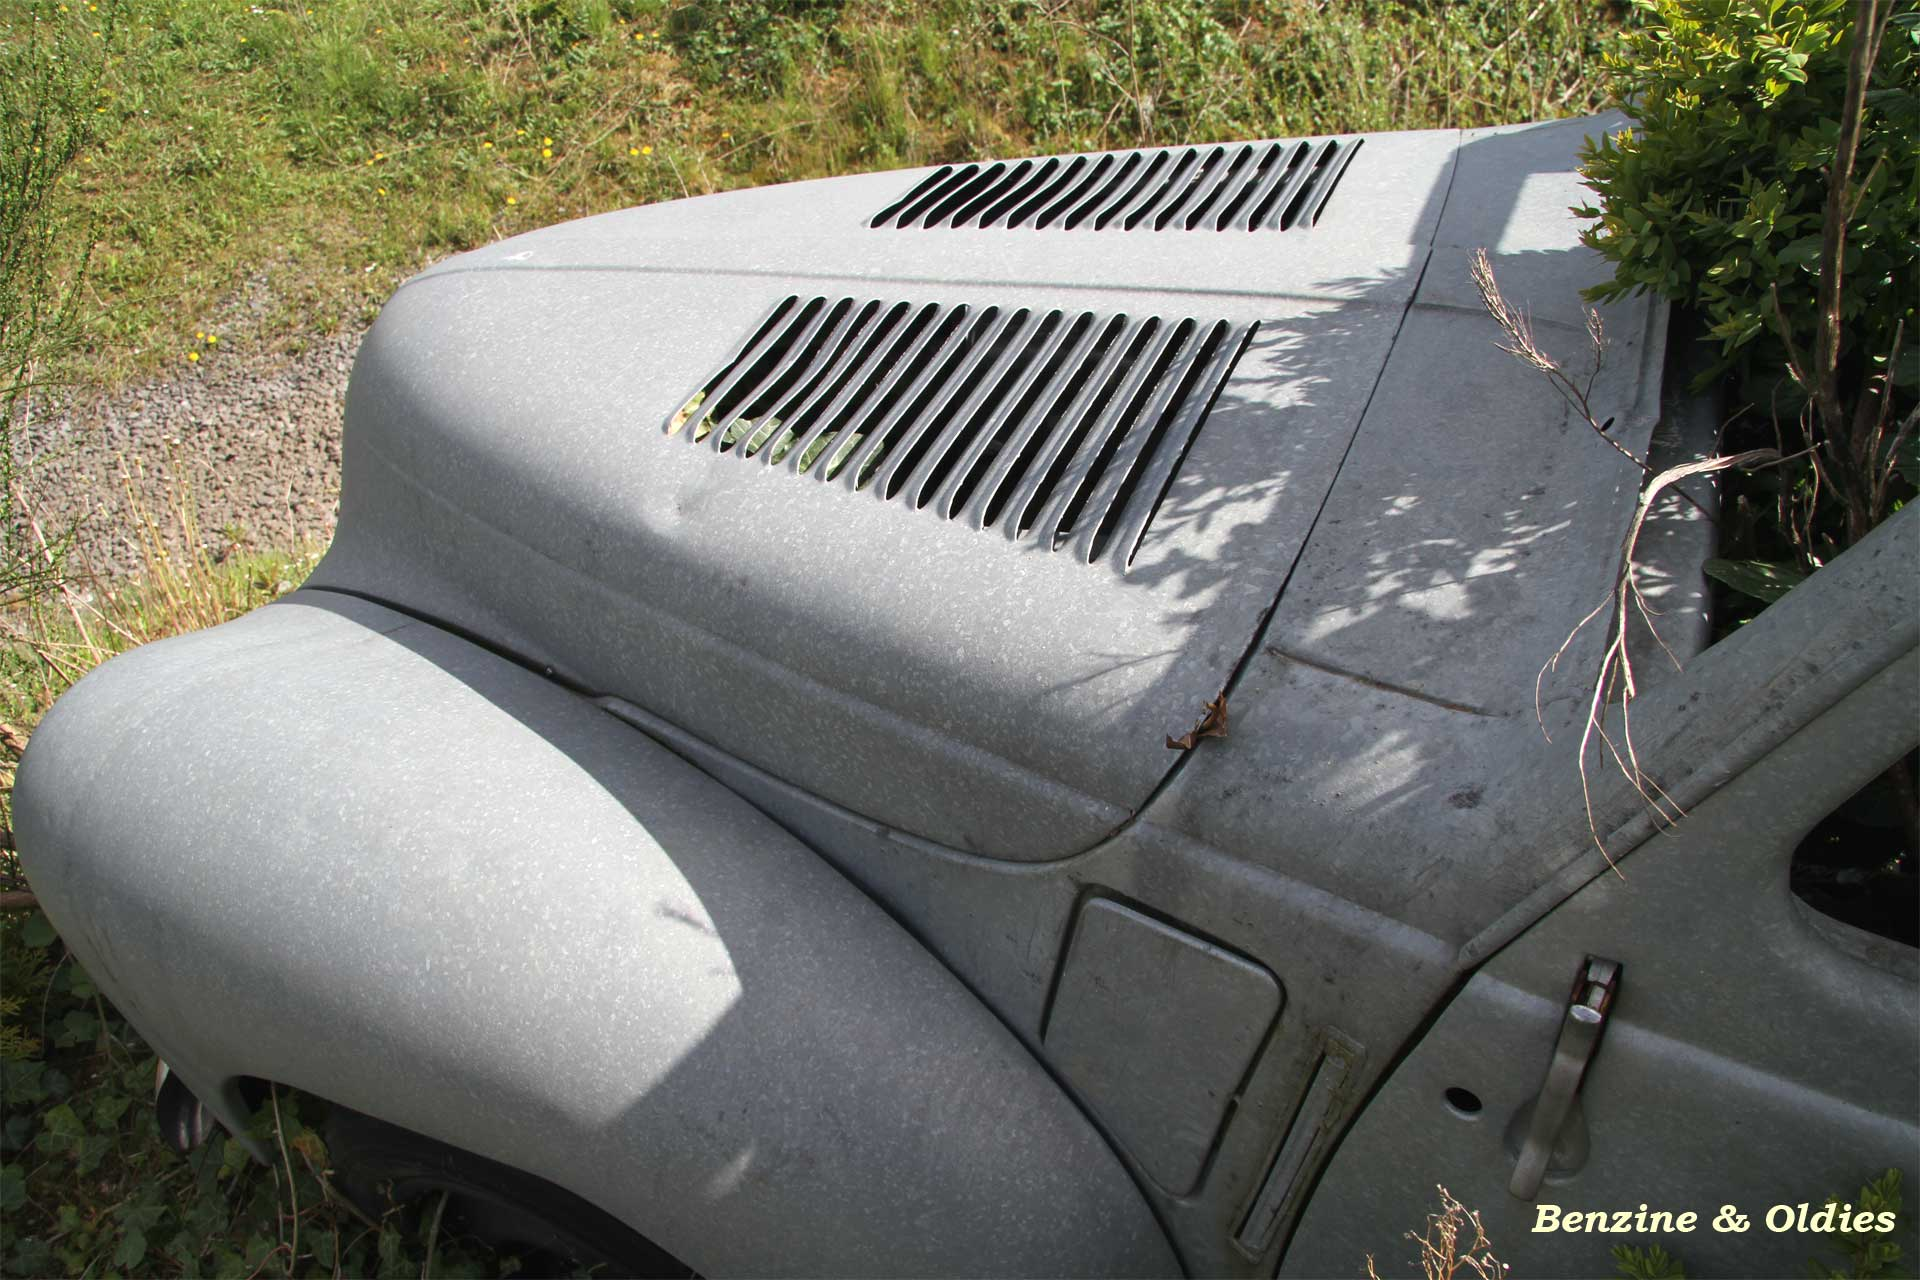 une Simca 6 carrosserie aluminium oubliée dans la nature - Simca6 - Page 2 686763simca6street39w19201280